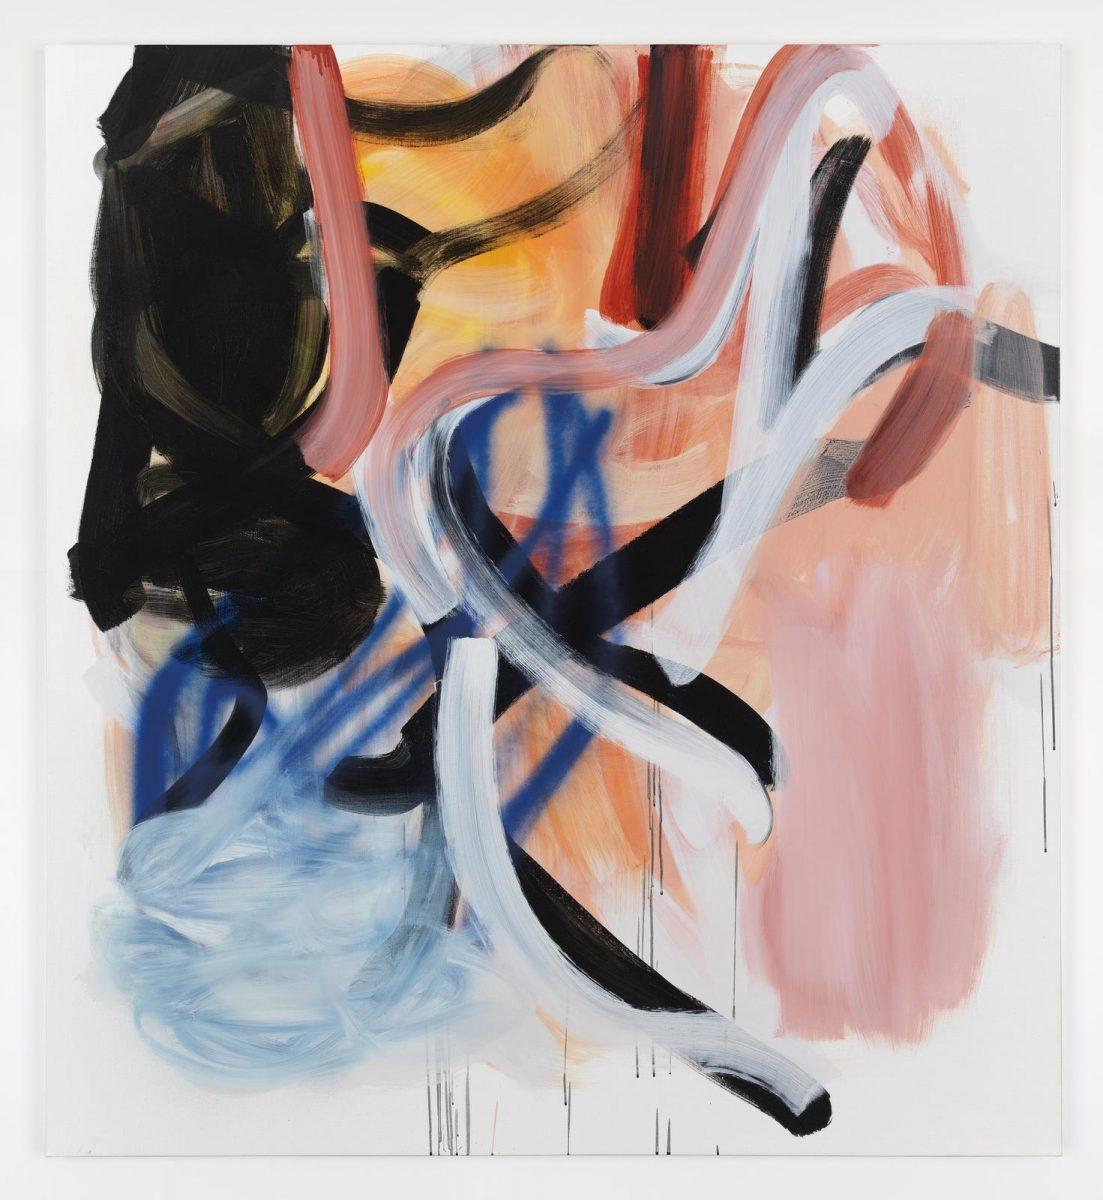 Liliane Tomasko,dark goes lightly, 2018, Acrylic and acrylic spray on linen 172.7 x 157.5 cm / 68 x 62 in | Liliane Tomasko: The Red Thread | Saturday 9 March  – Saturday 13 April 2019 | Kerlin Gallery